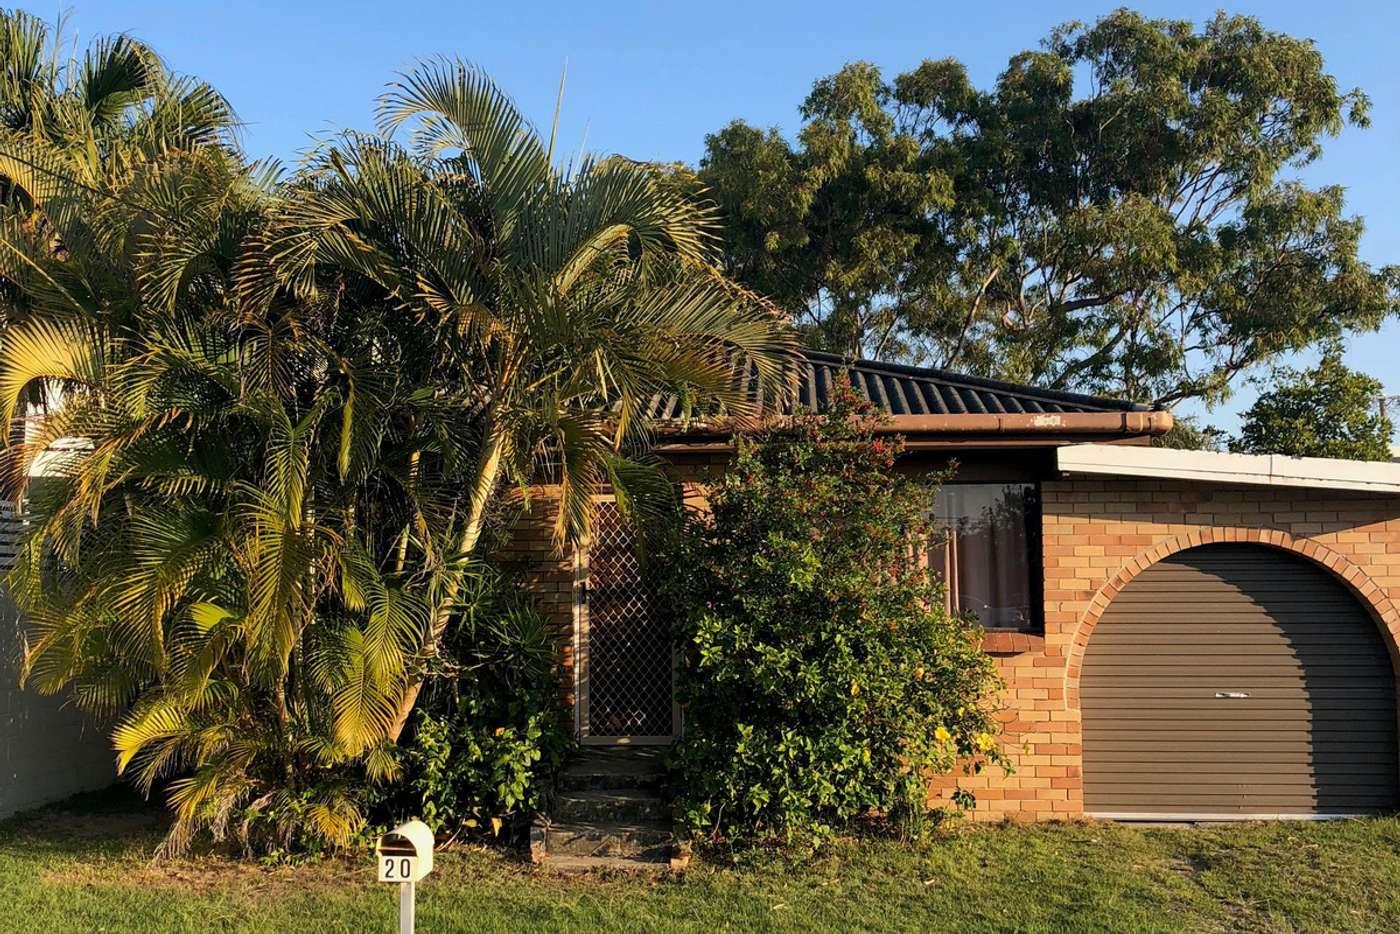 Main view of Homely house listing, 20 Heron Avenue, Mermaid Beach QLD 4218